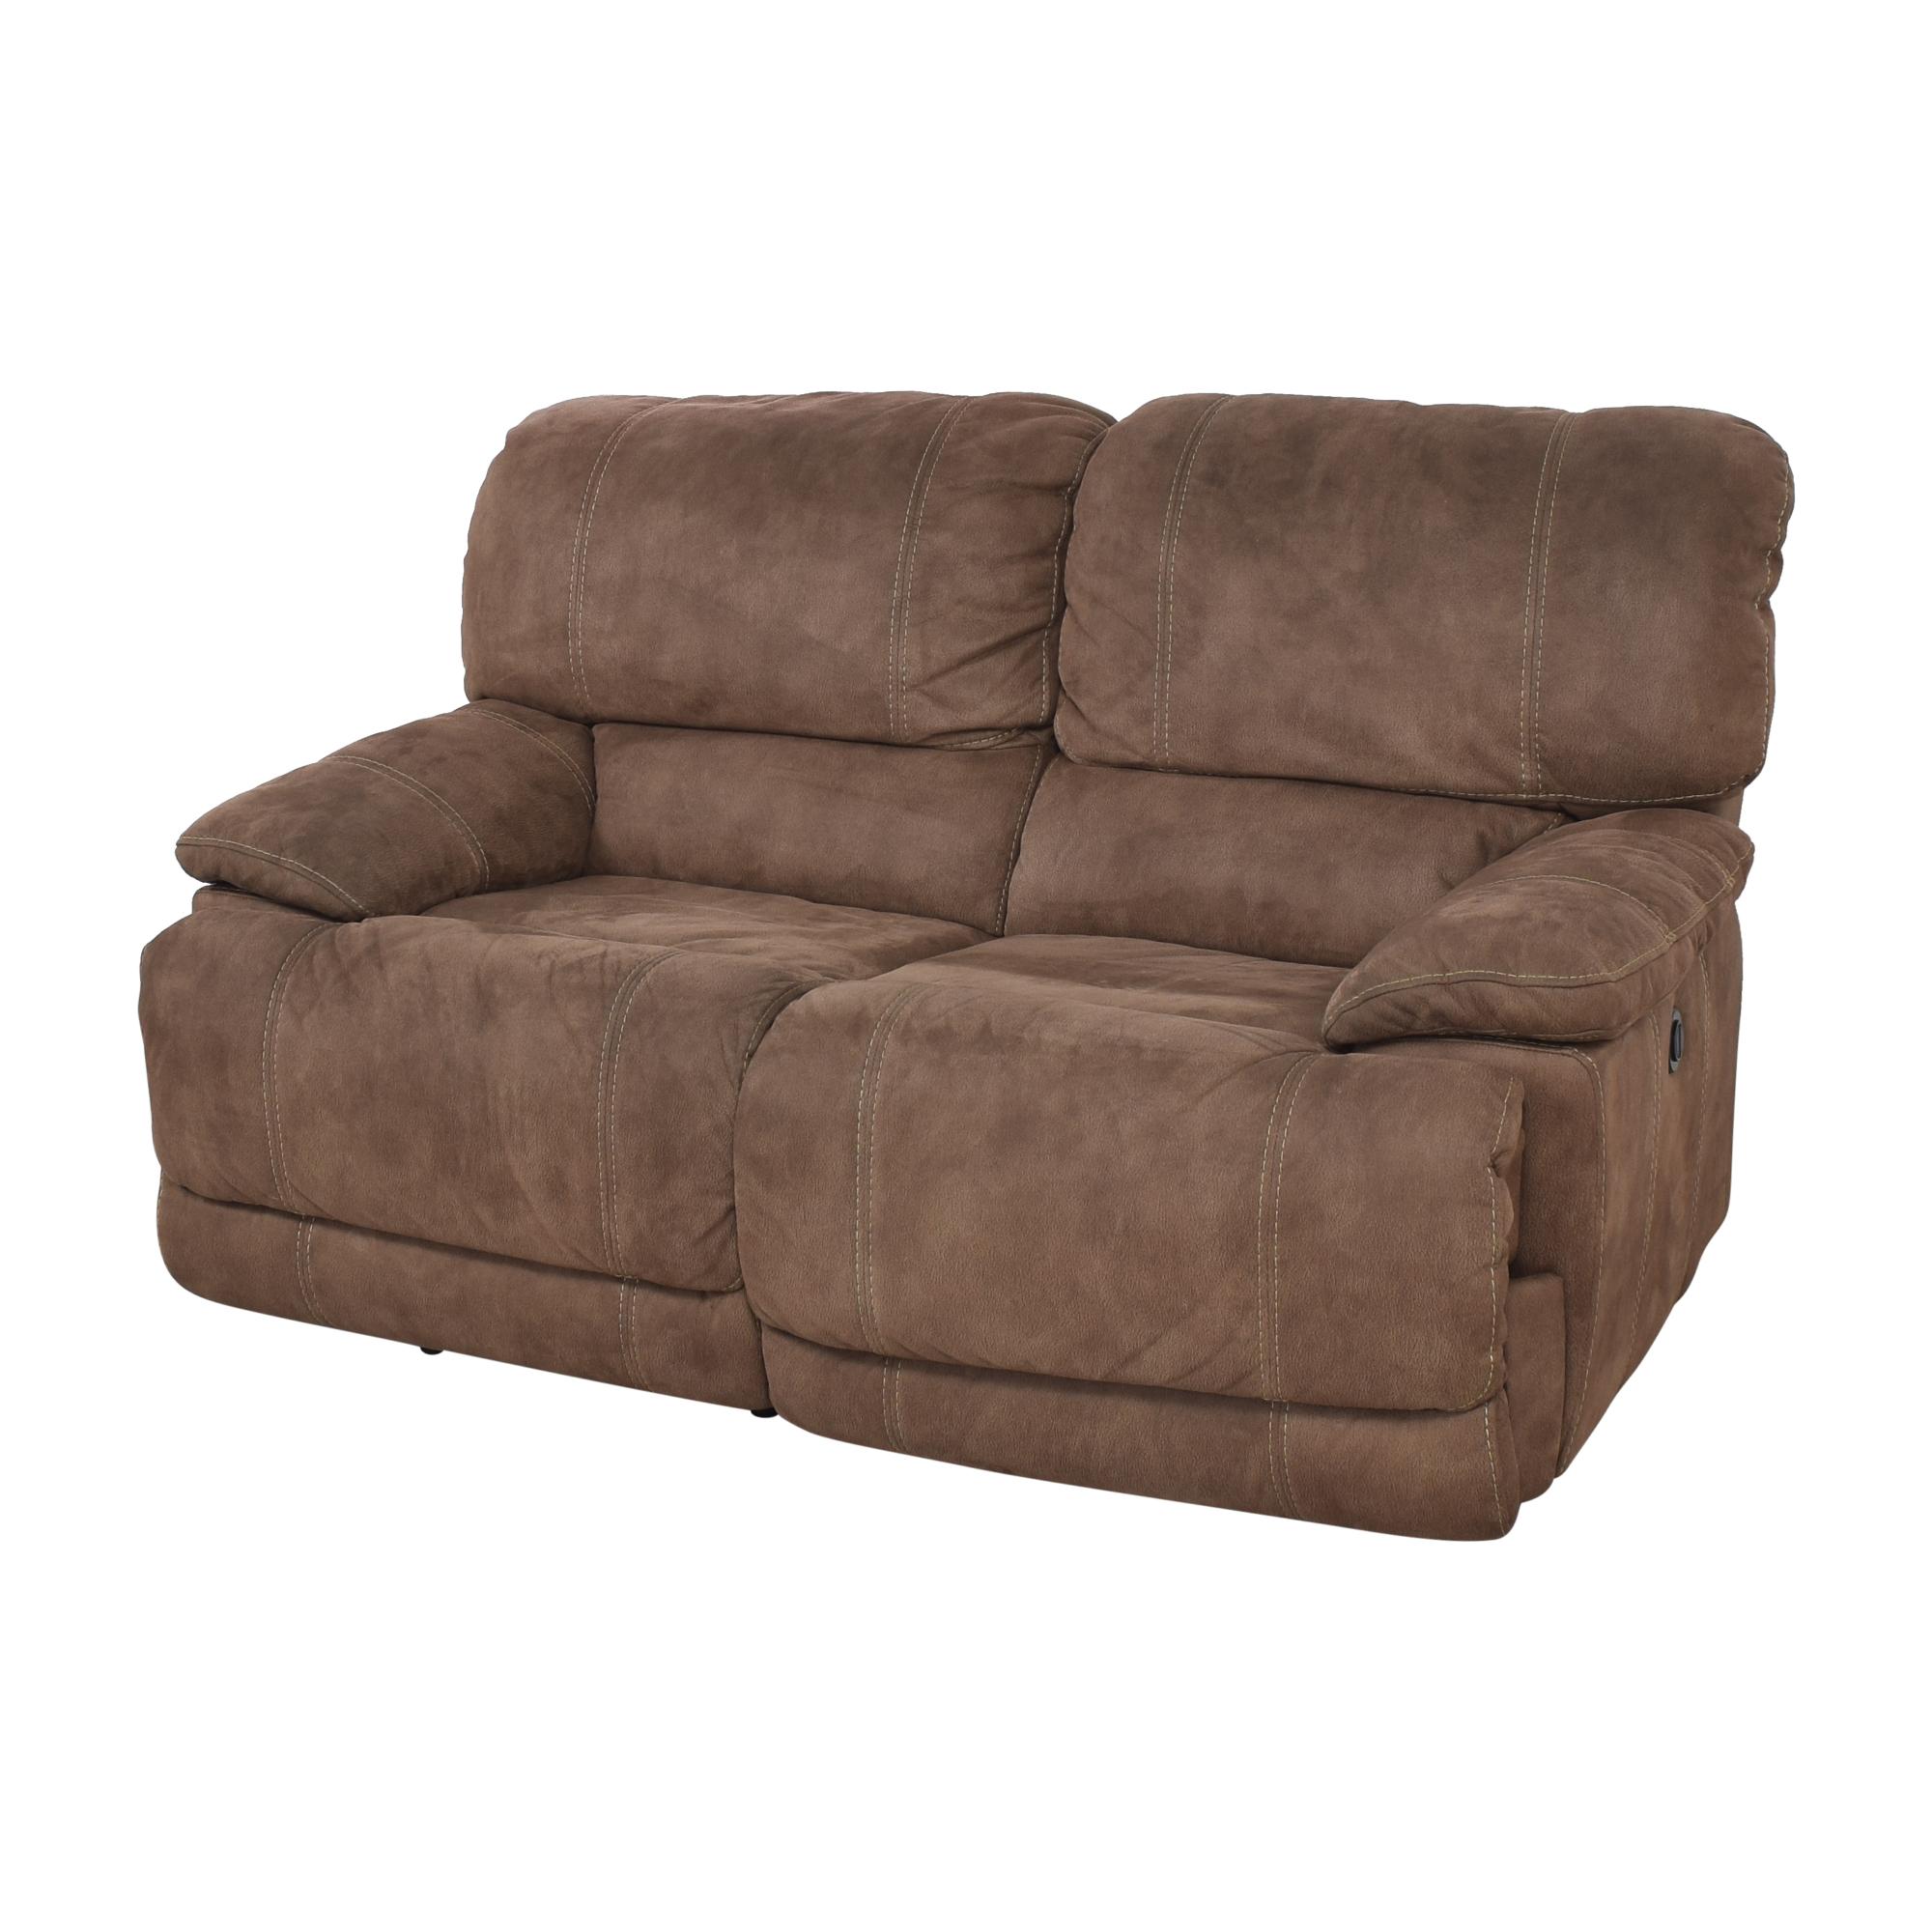 Macy's Power Reclining Felyx Sofa sale